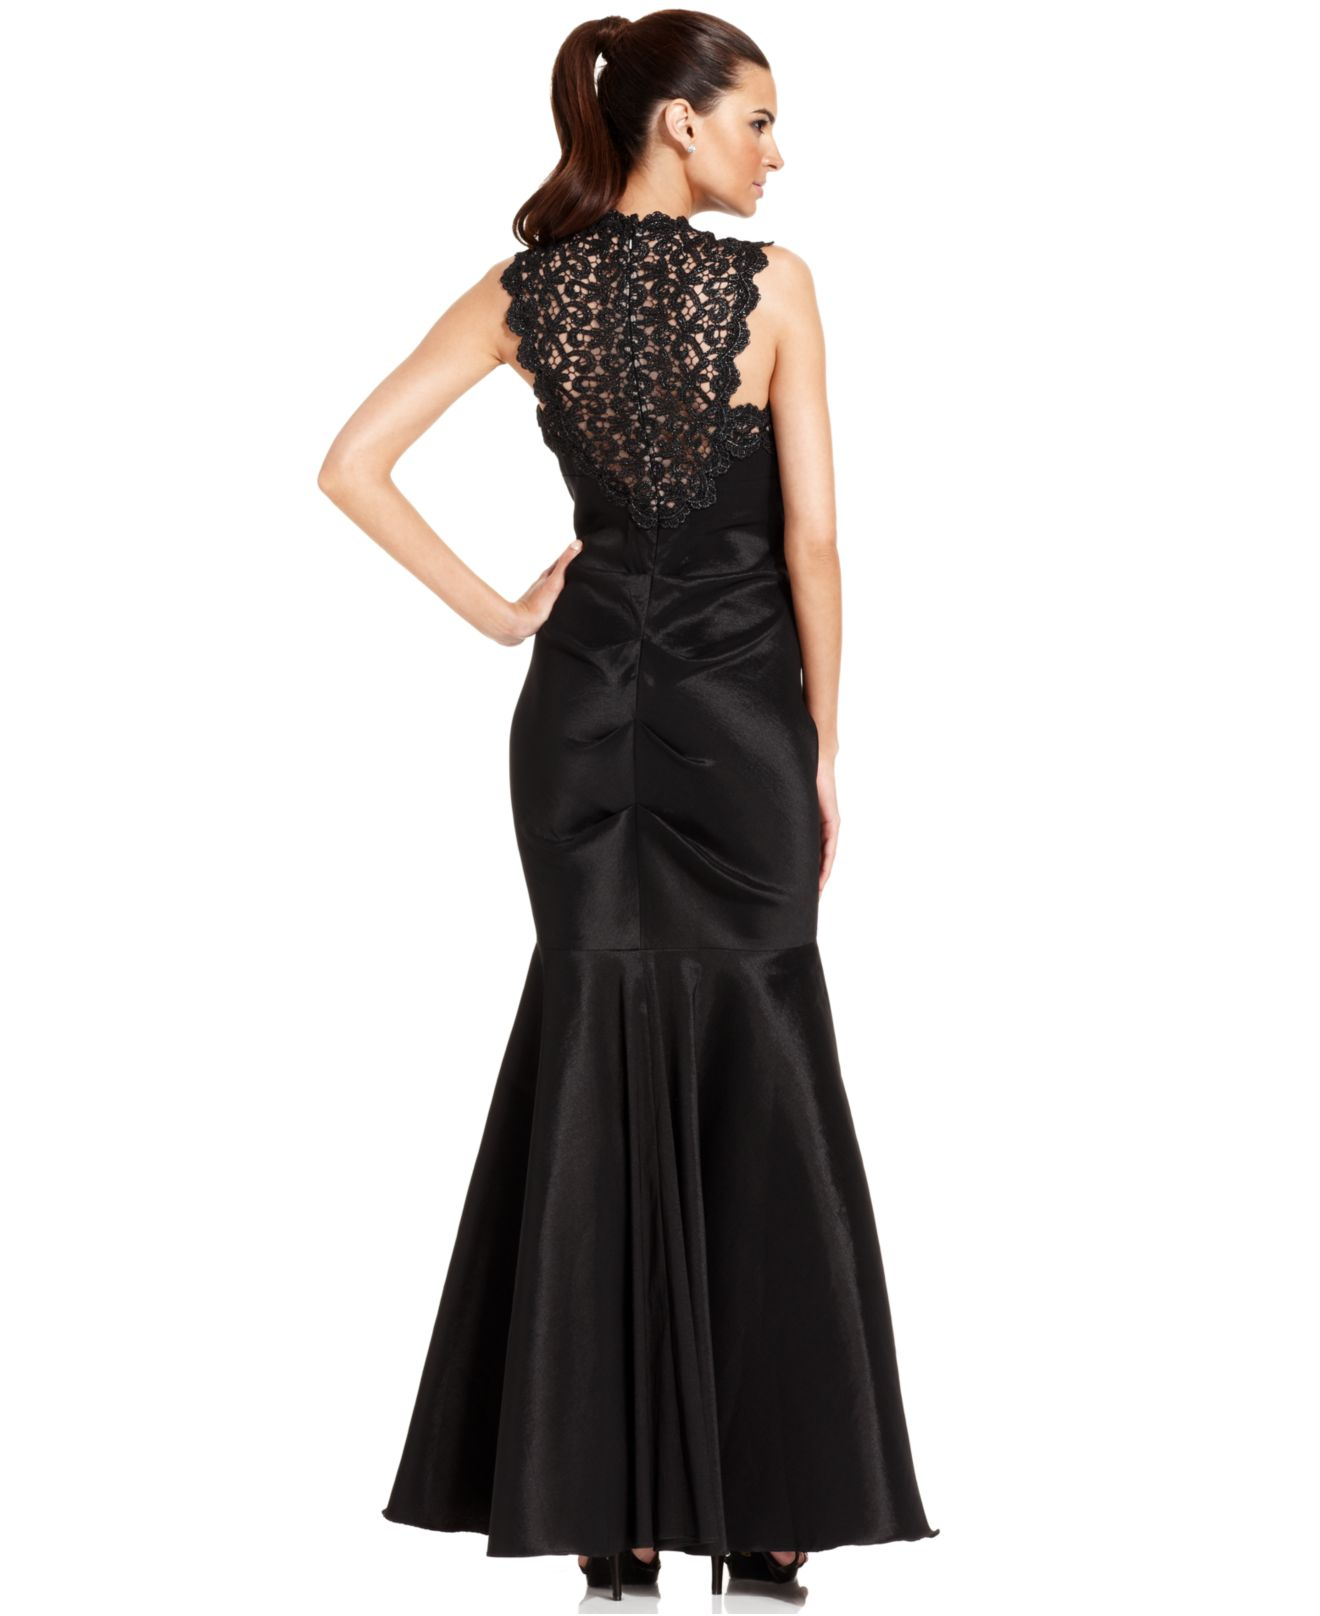 Lyst - Xscape Petite Sleeveless Glitter-lace Mermaid Gown in Black